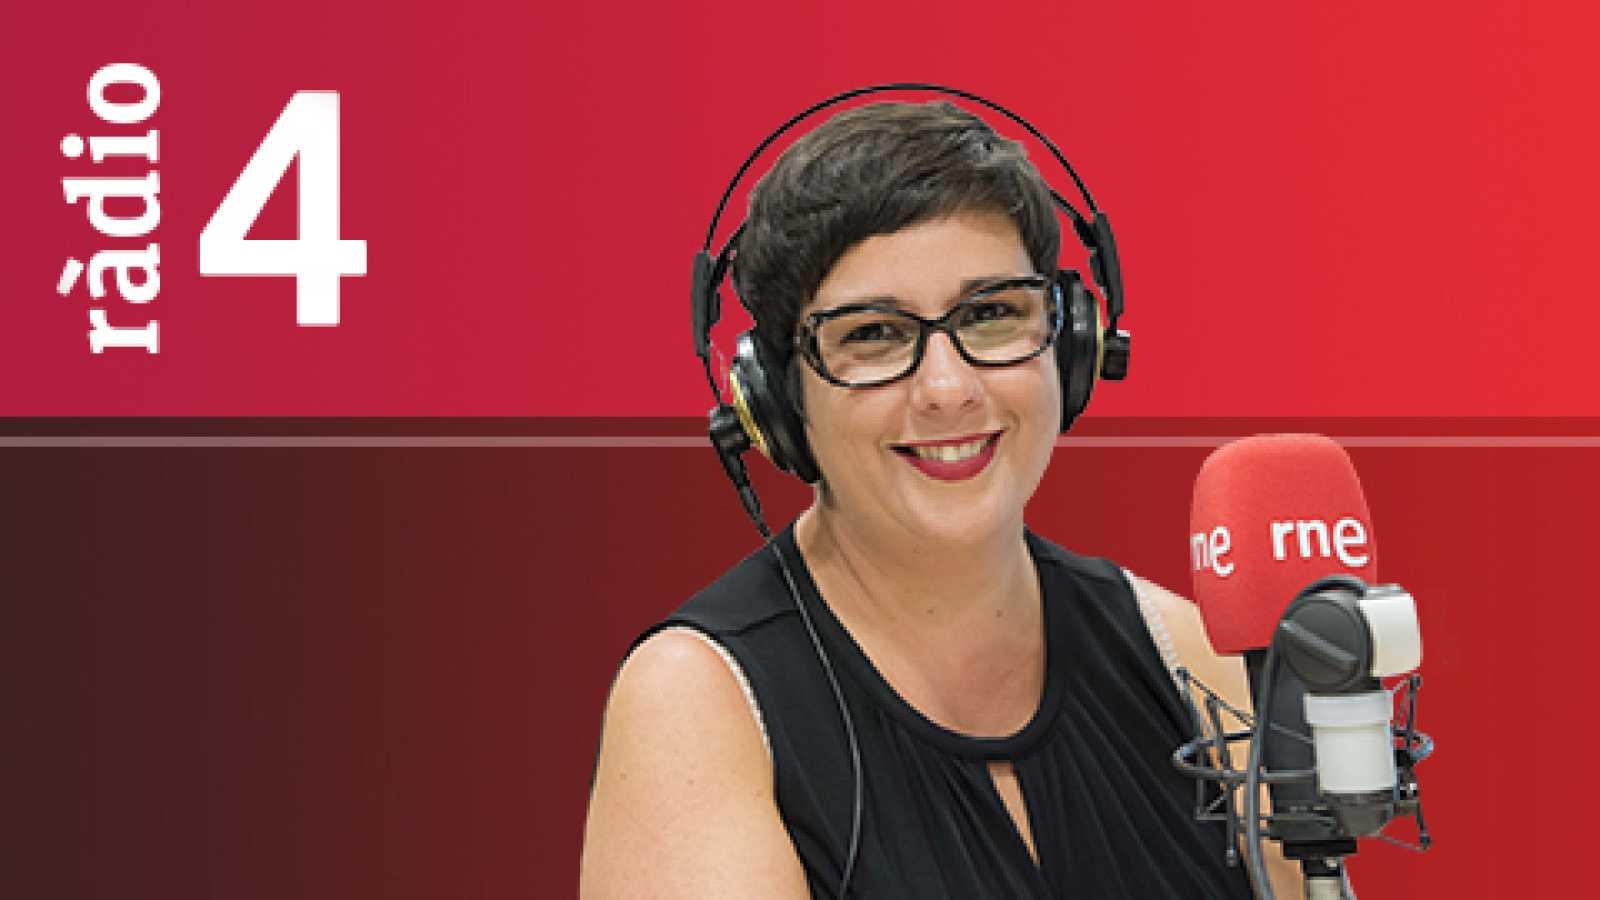 Realpolitik - Anna Caula, Mar Ampurdanés, Lucas Ferro